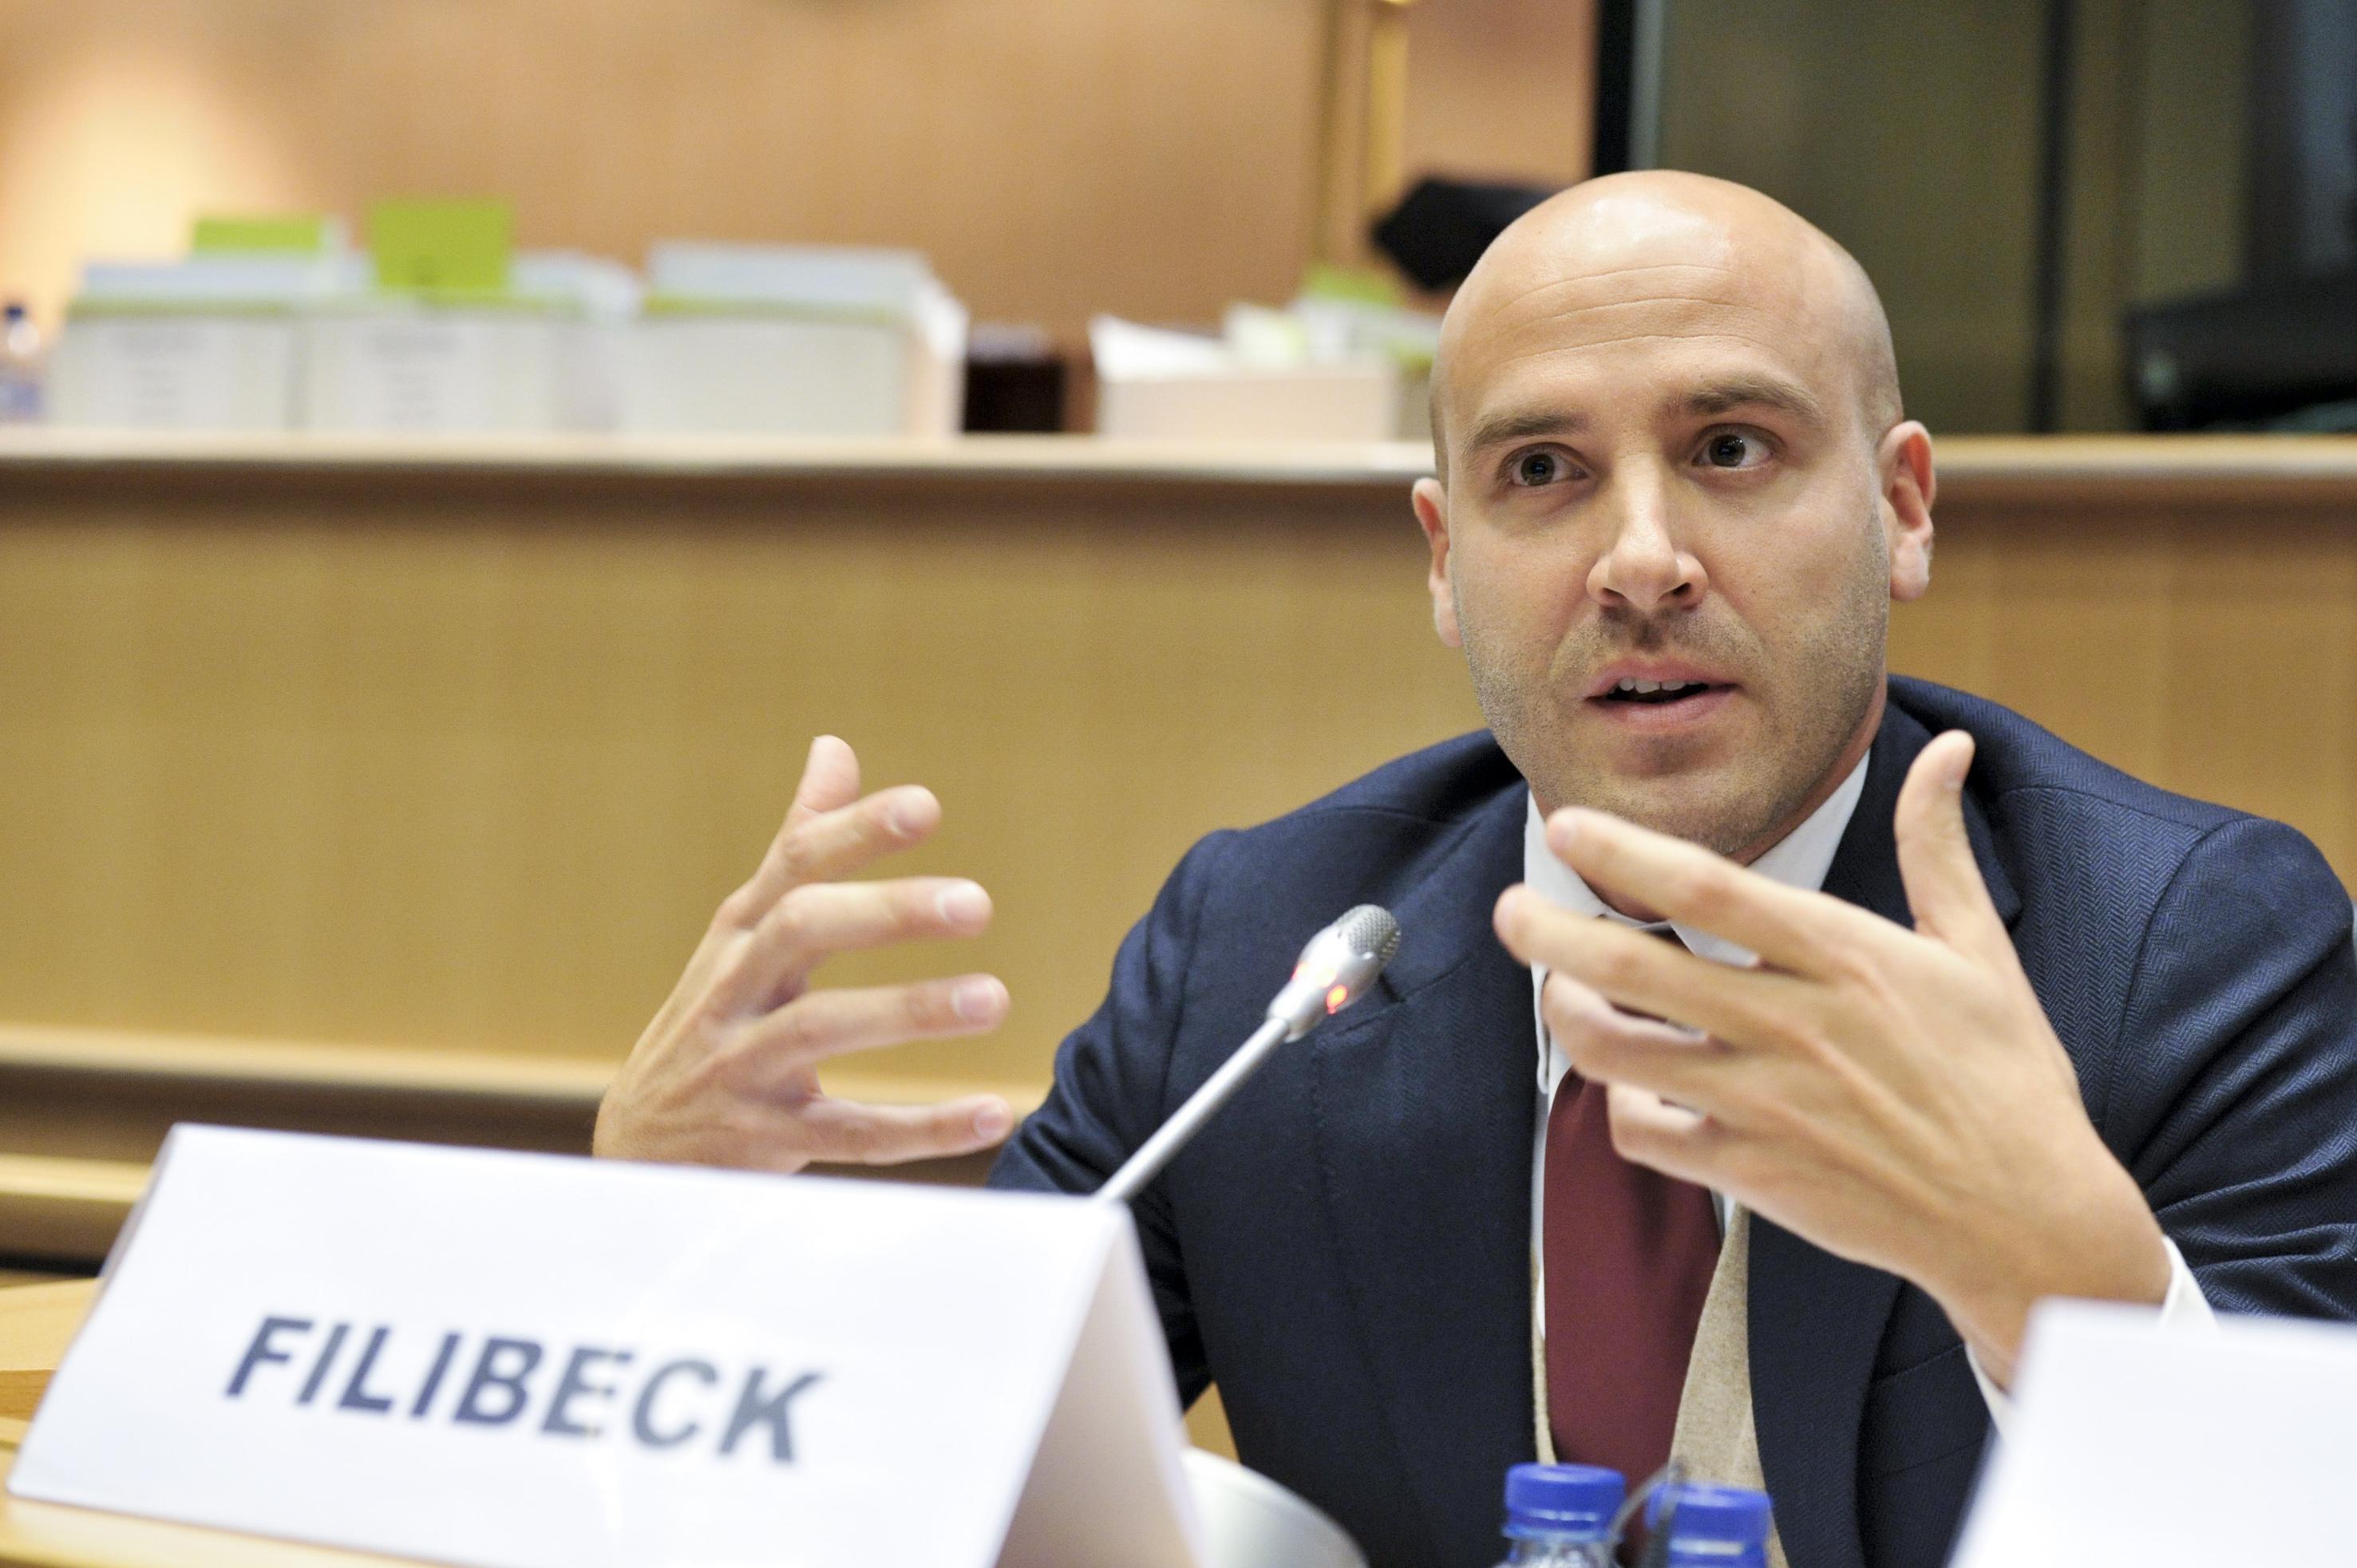 PES Deputy Secretary General Giacomo Filibeck